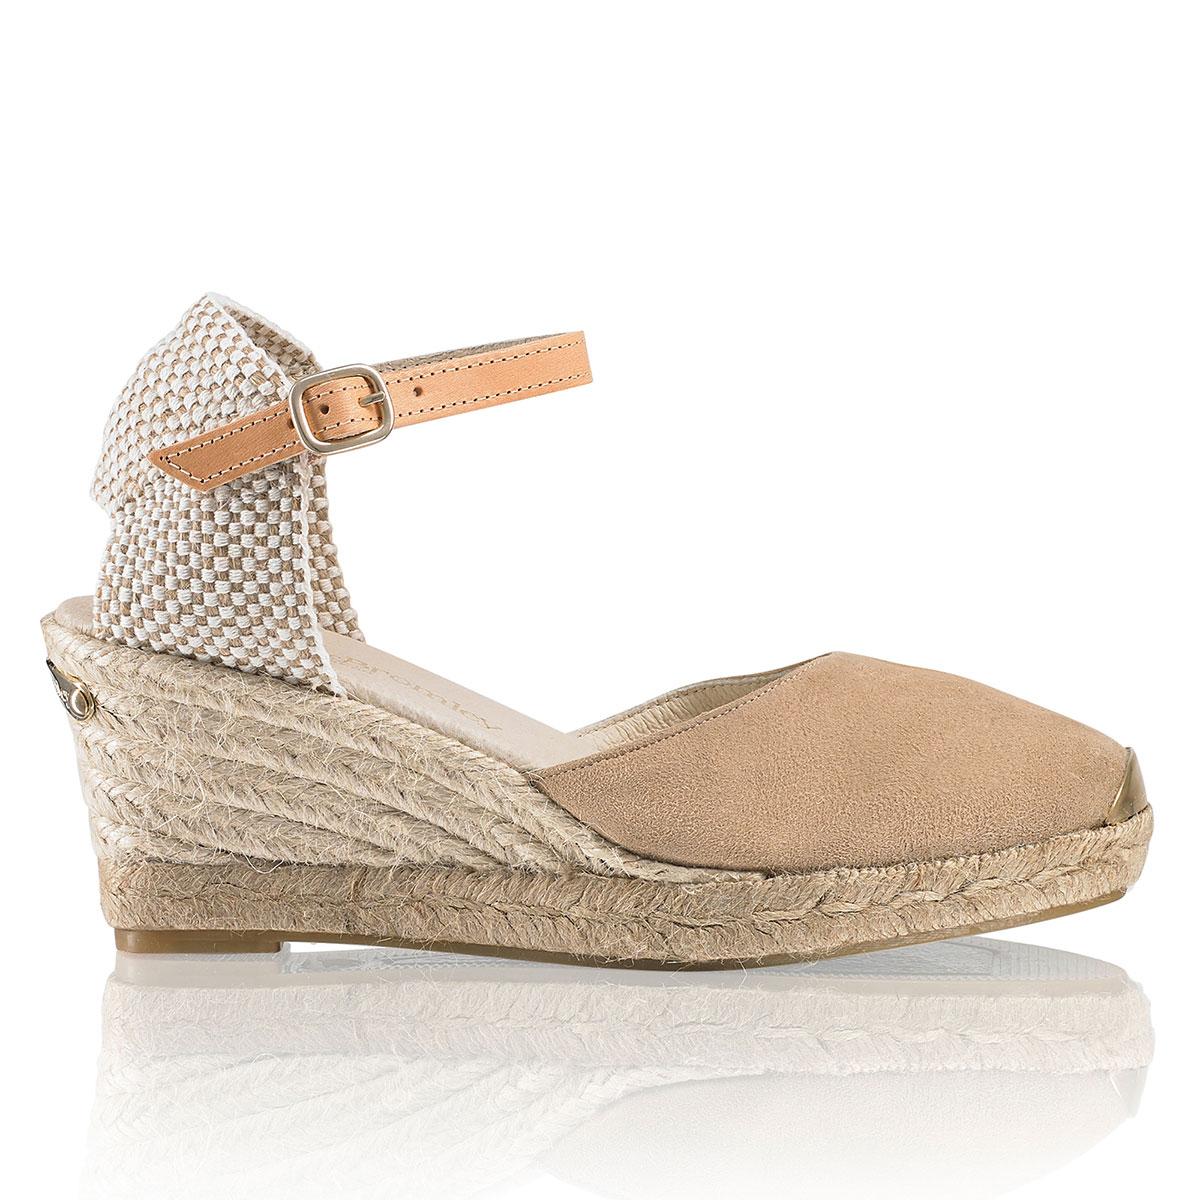 kate-middleton-fashion-shoes.jpg